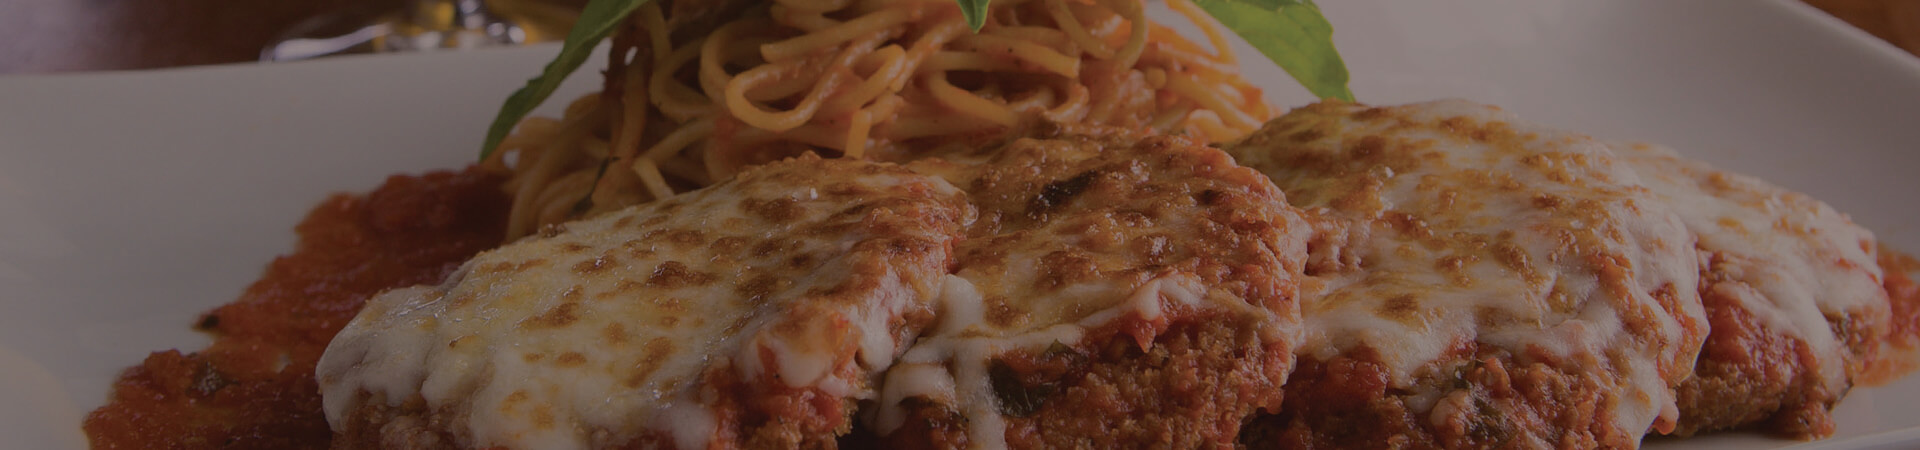 Italian Food Menus | Lunch, Dinner & Take Out | Biaggi\'s Italian ...